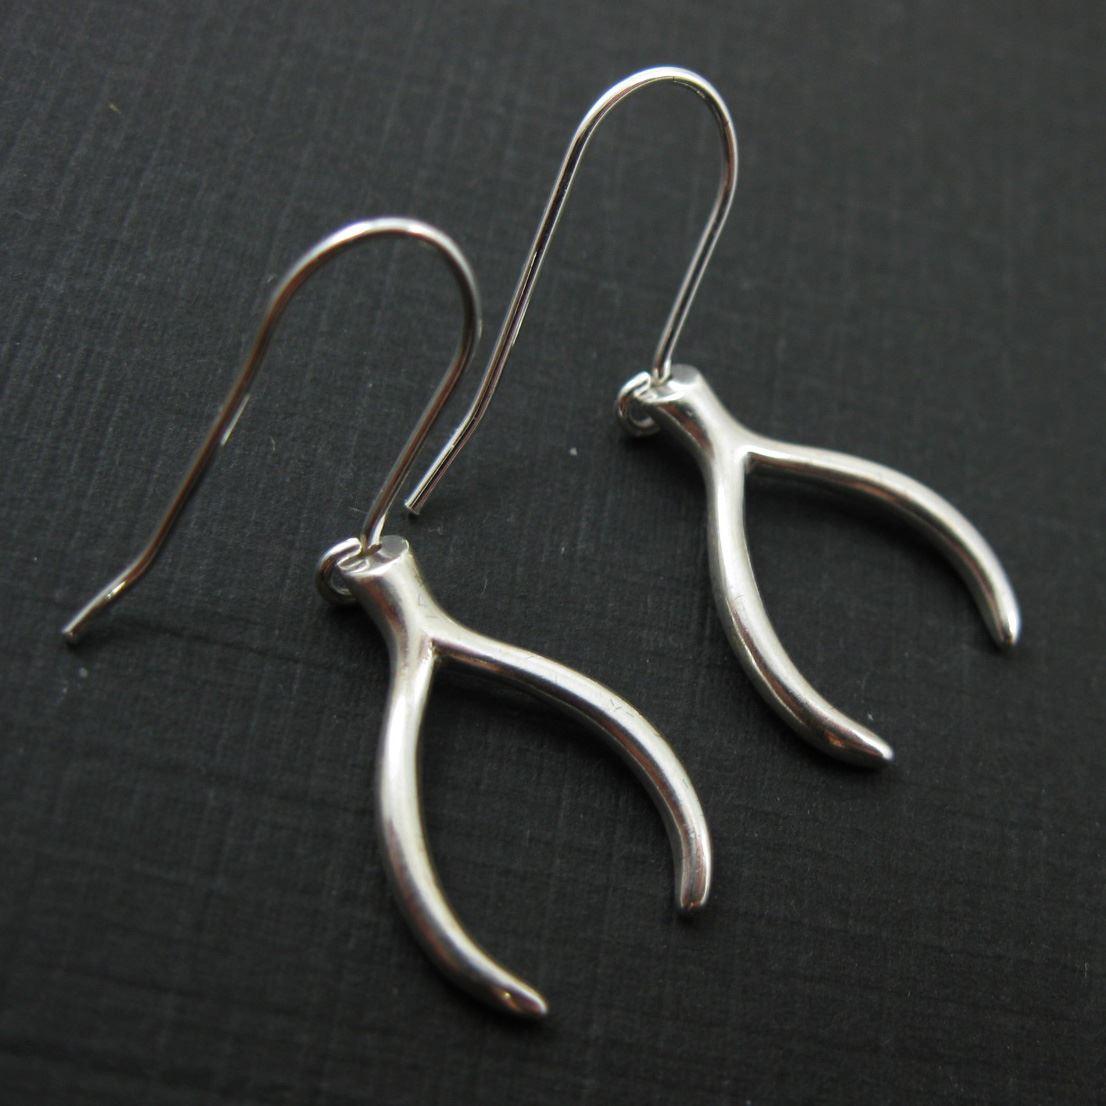 925 Sterling Silver Earrings- Wishbone Charm